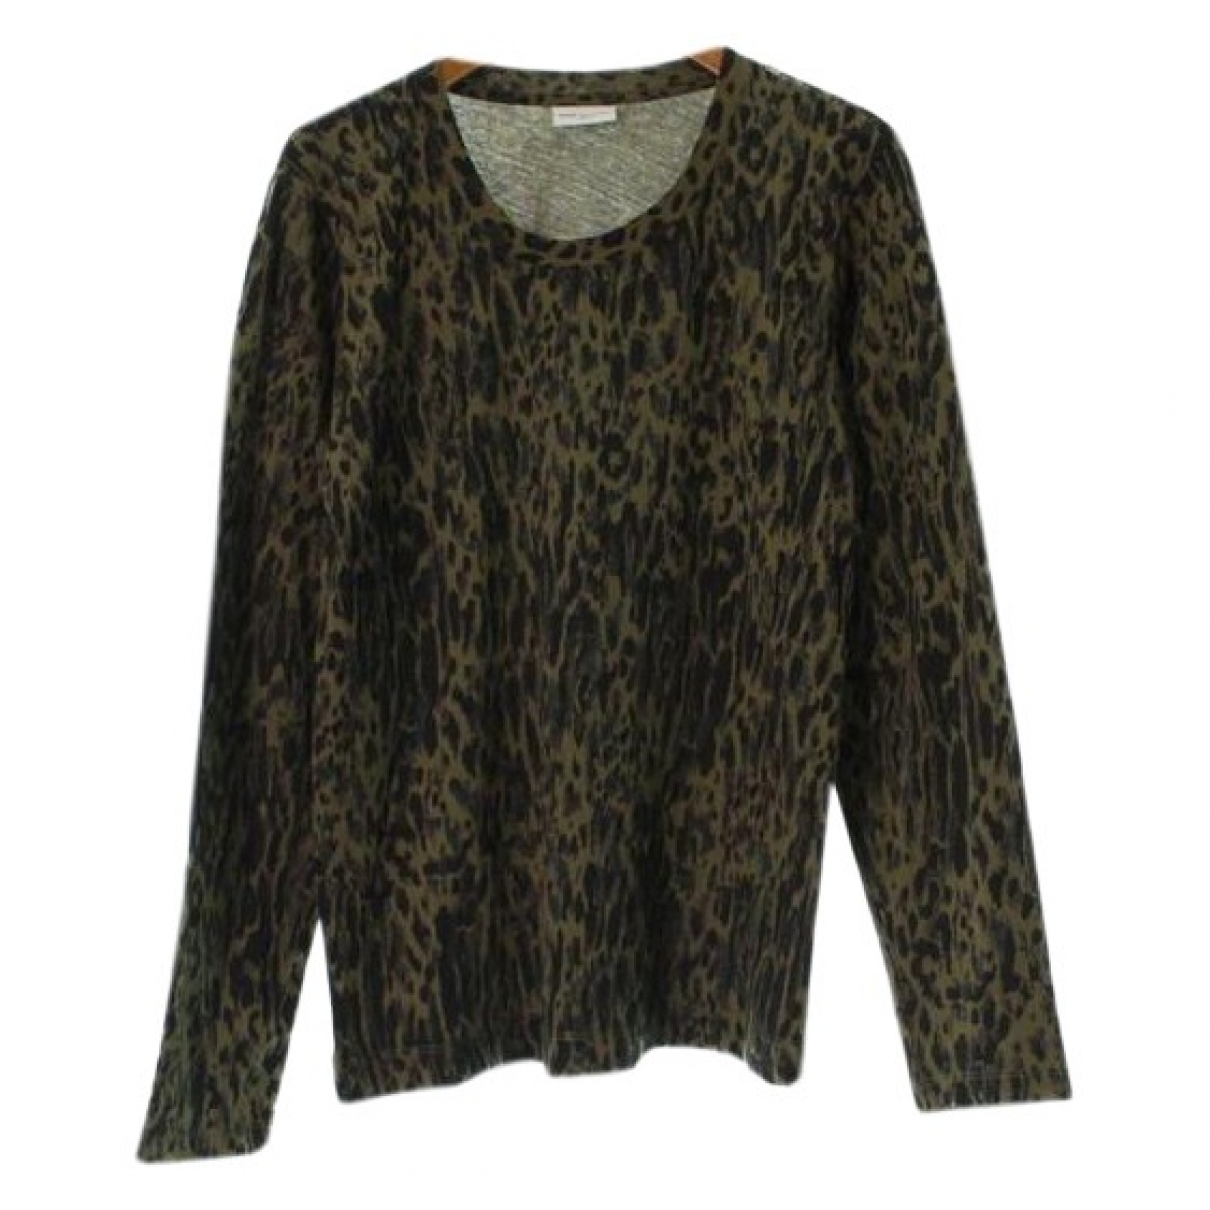 Dries Van Noten \N Khaki Cotton  top for Women S International